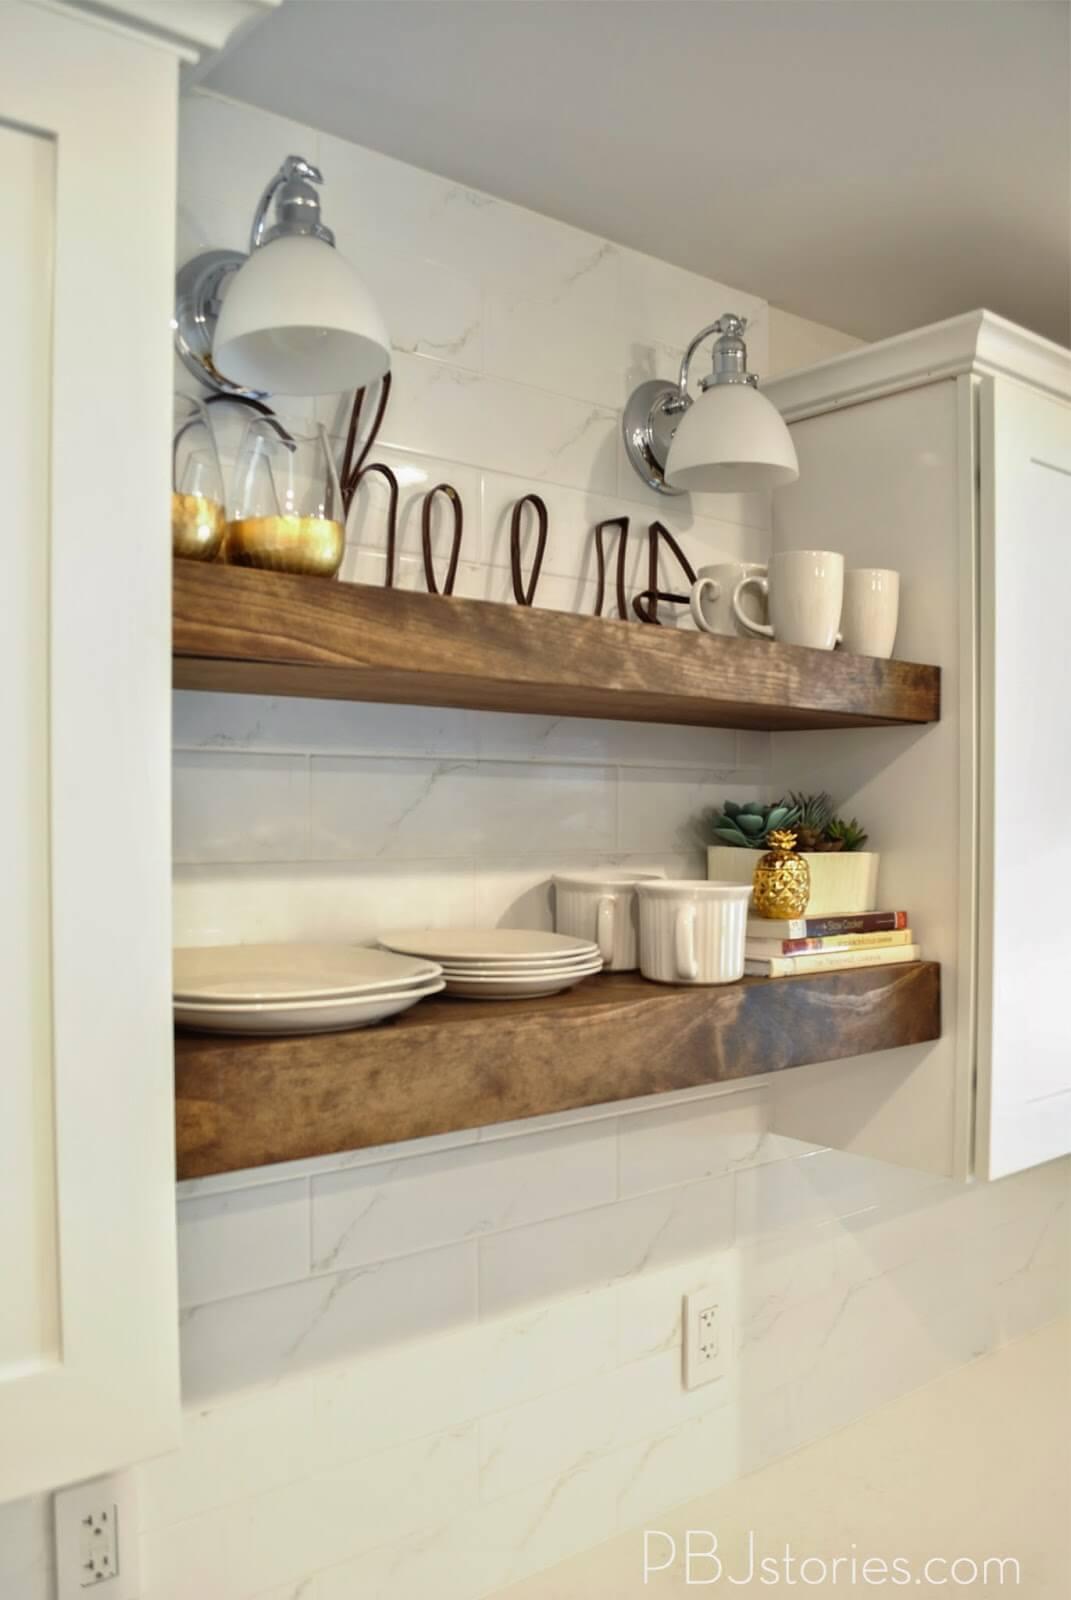 best diy floating shelf ideas and designs for homebnc kitchen shelves comfy breakfast nook display antique mantel key coat hanger small corner rack closet hacks black pins guitar